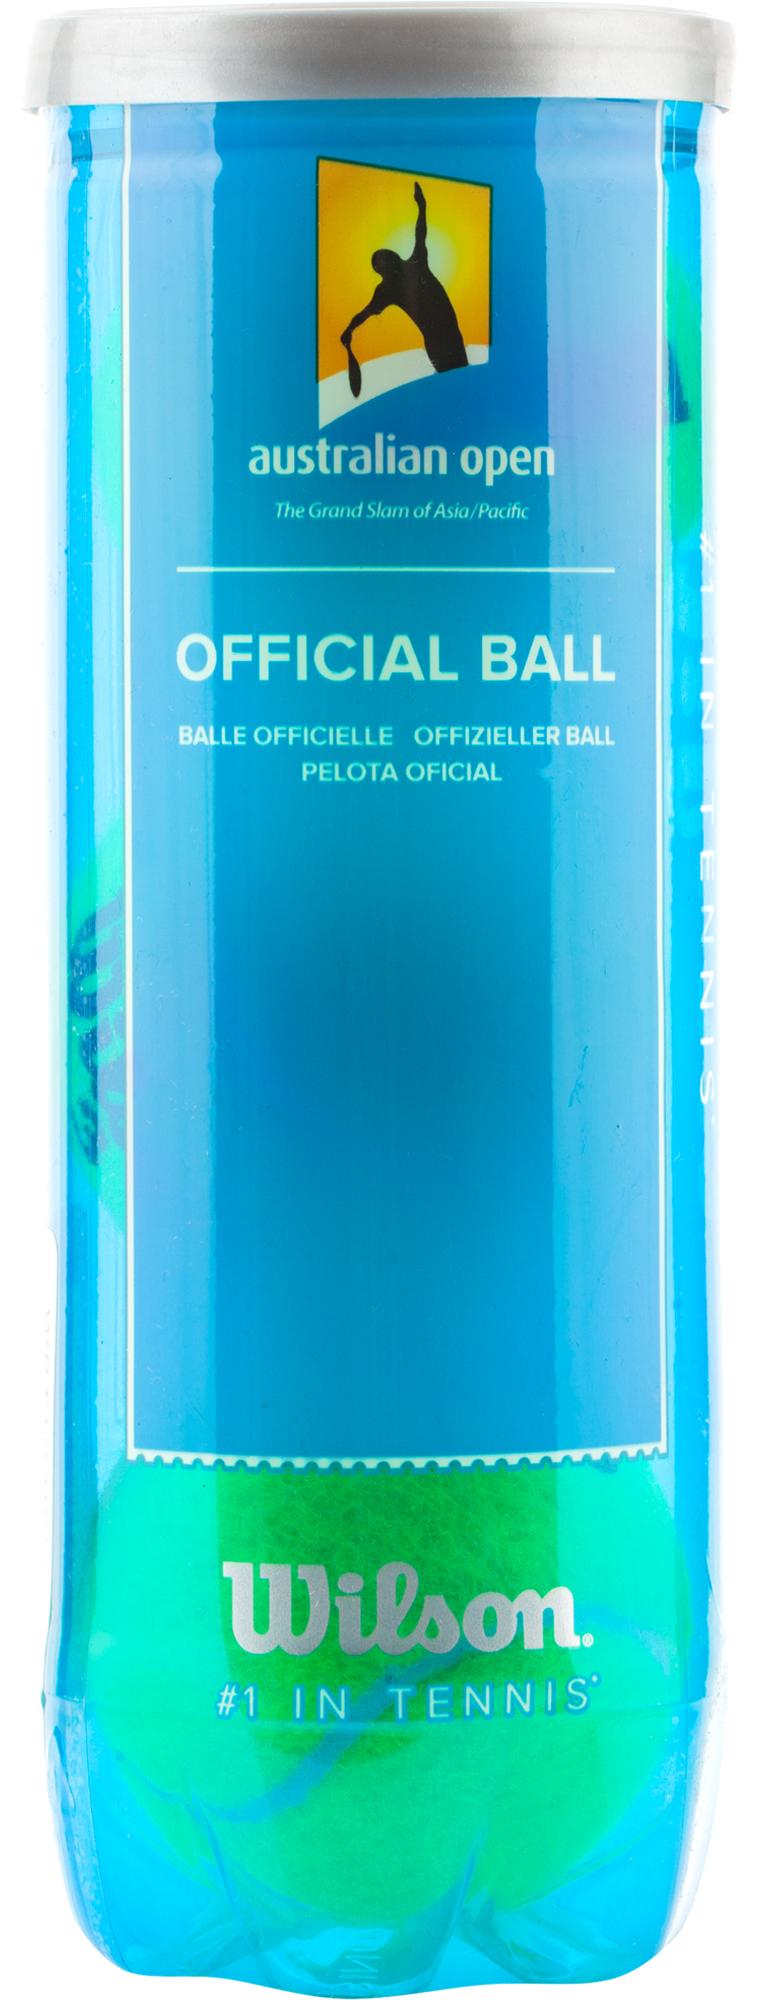 Wilson Набор теннисных мячей Australian Open 3 Ball